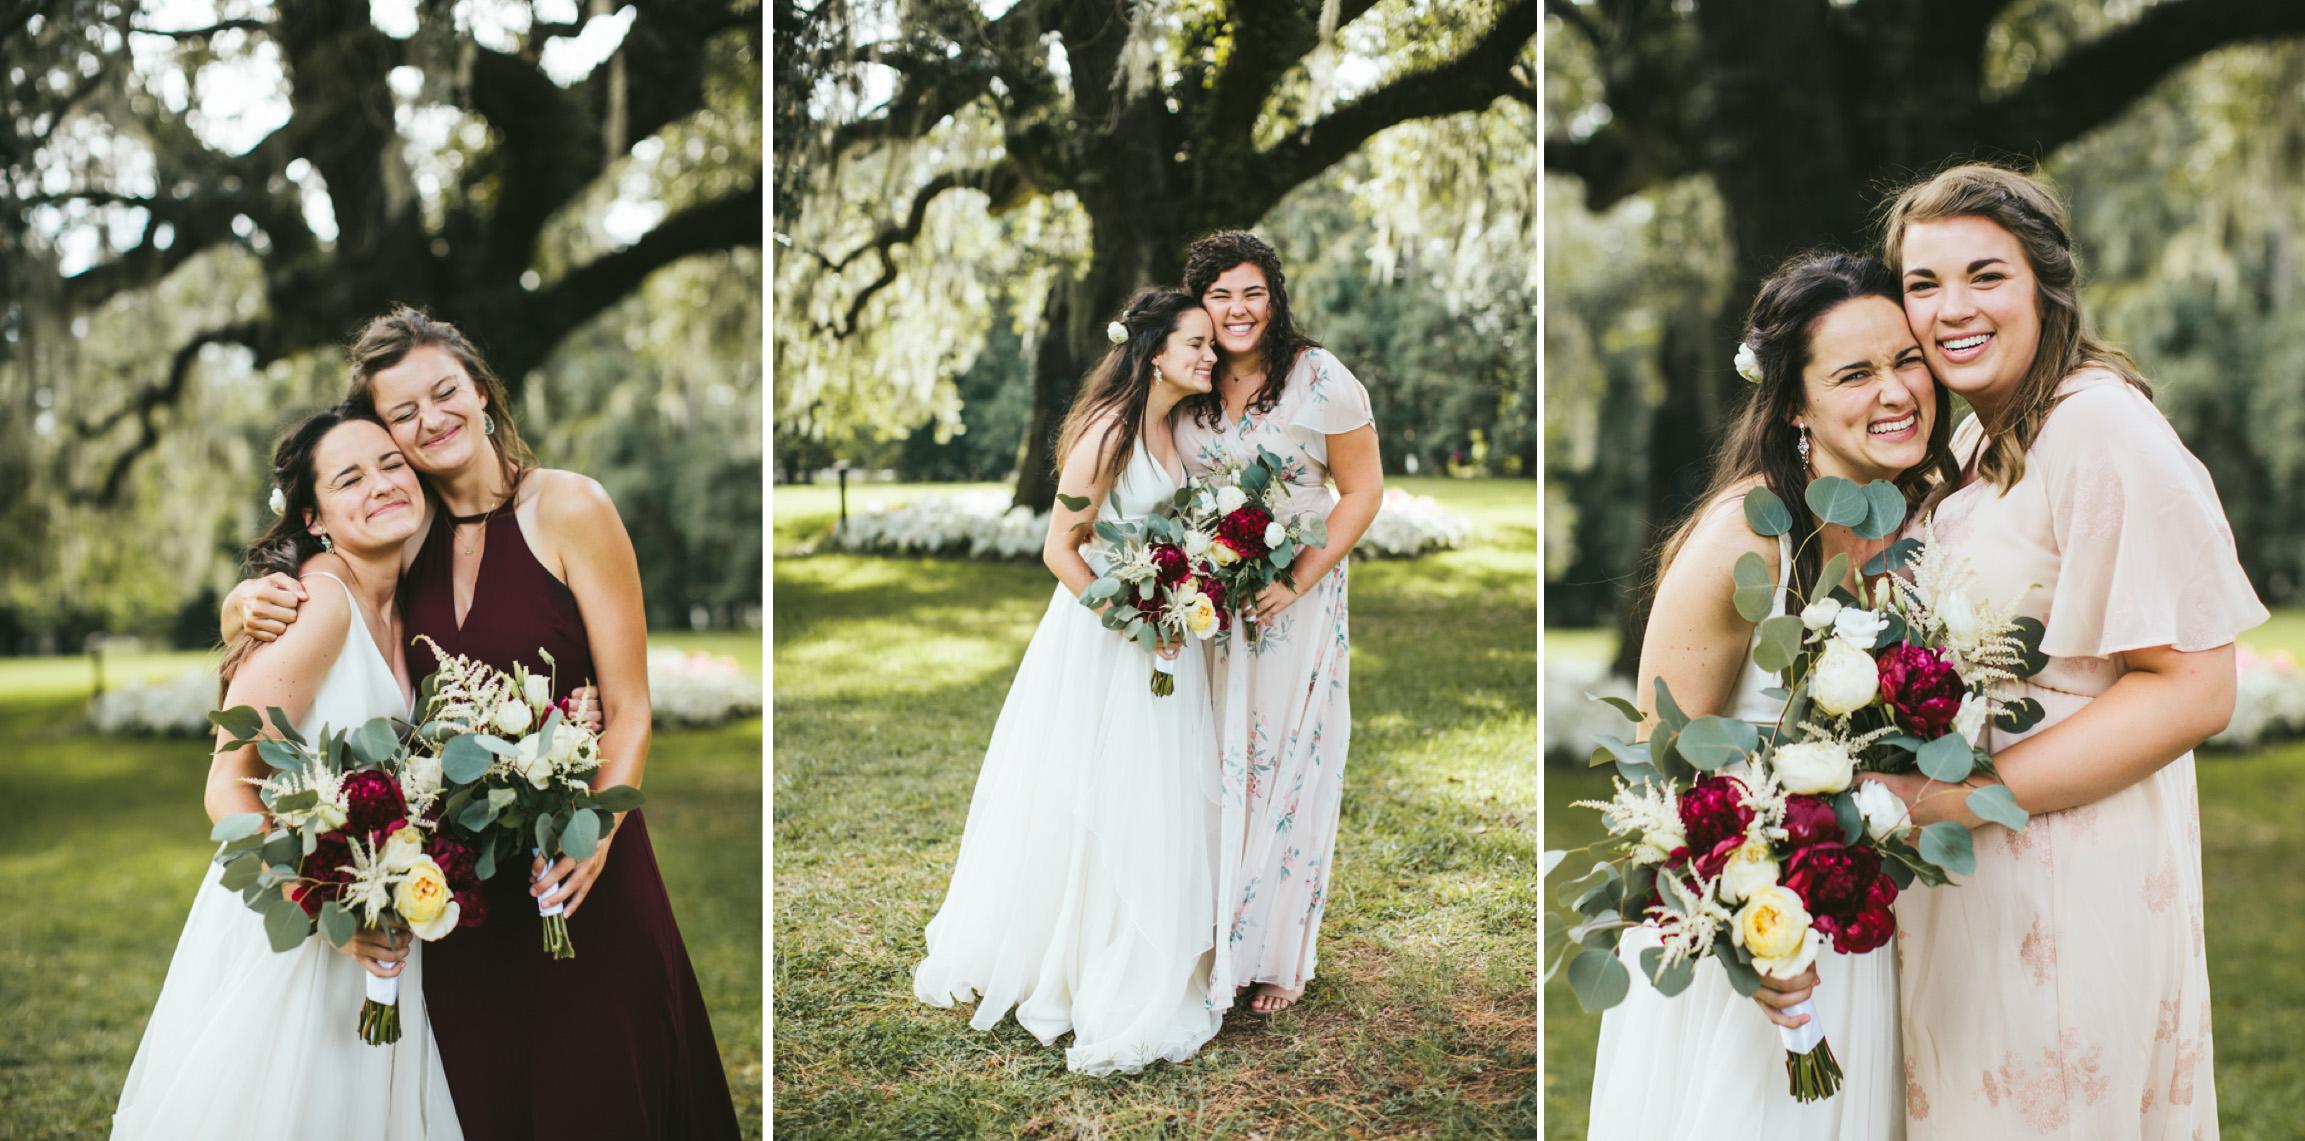 WeRomantics_MB_Wedding_BridesmaidsPortrait2.jpg